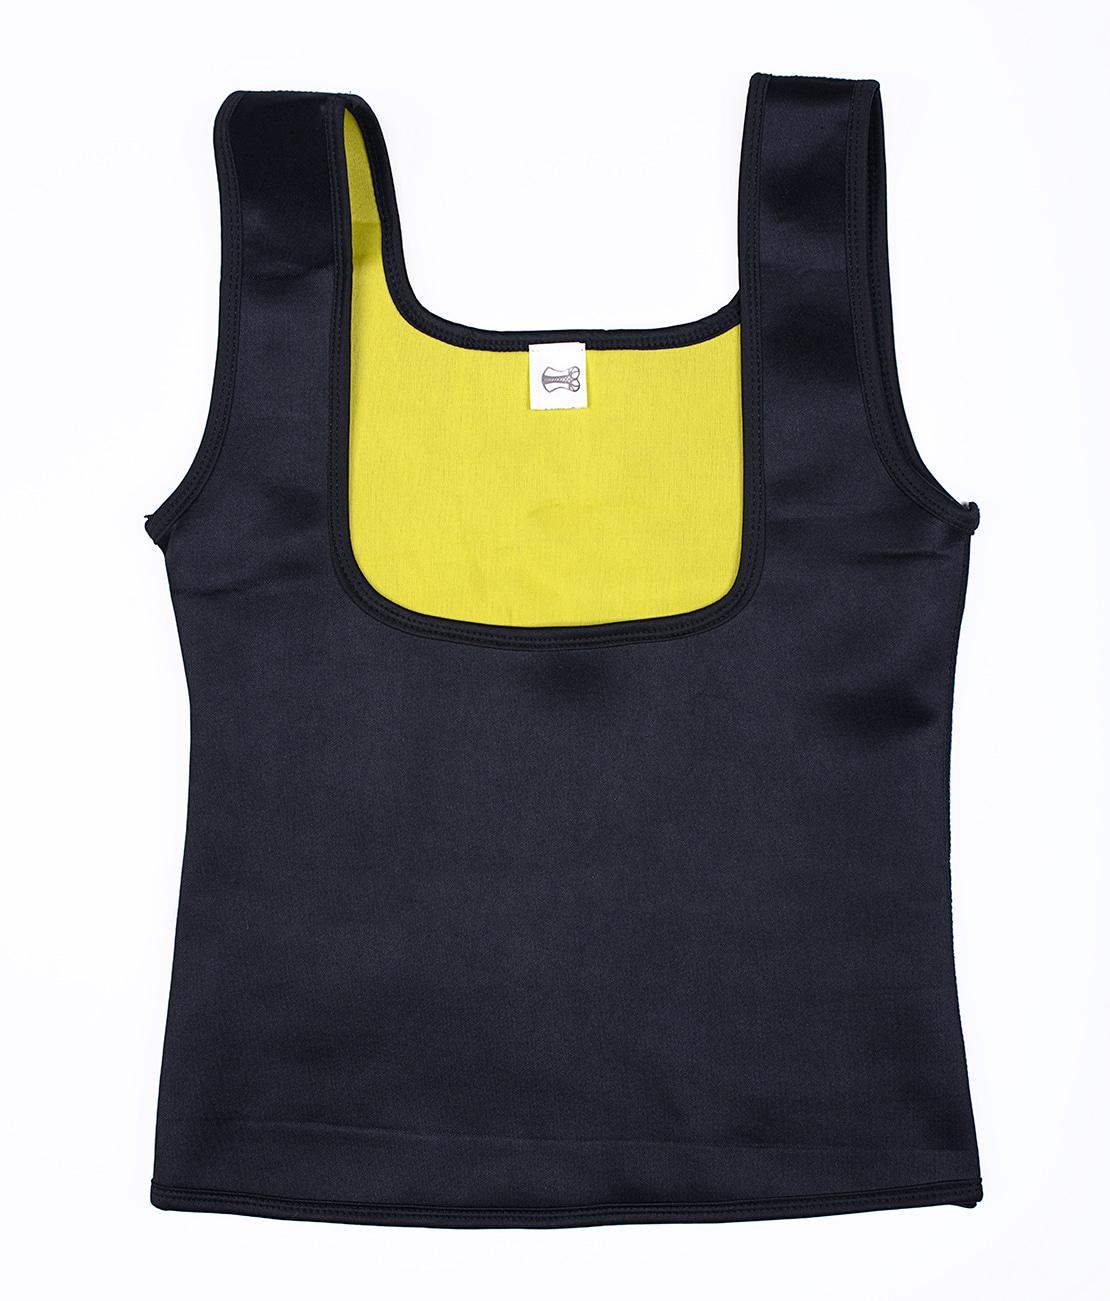 T-Shirt de sudation Noir Packshot Front